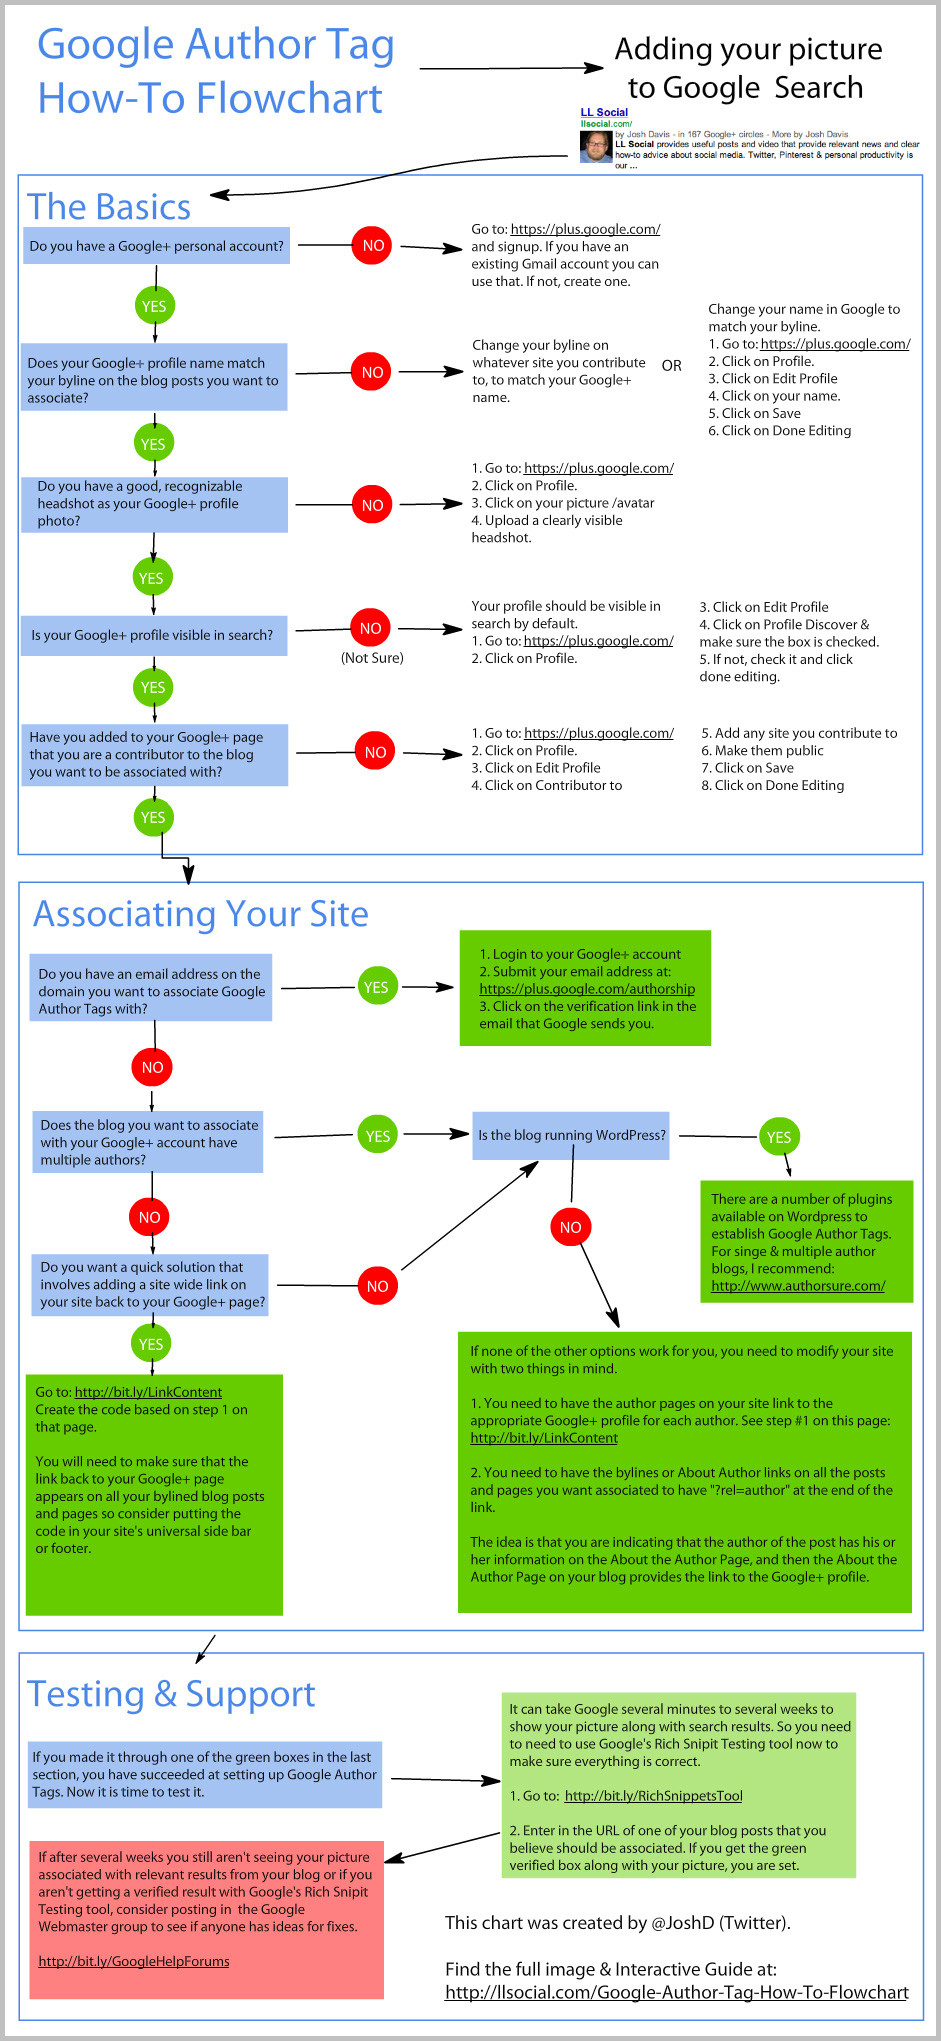 Google-Author-Tag-How-To-Fl.jpg